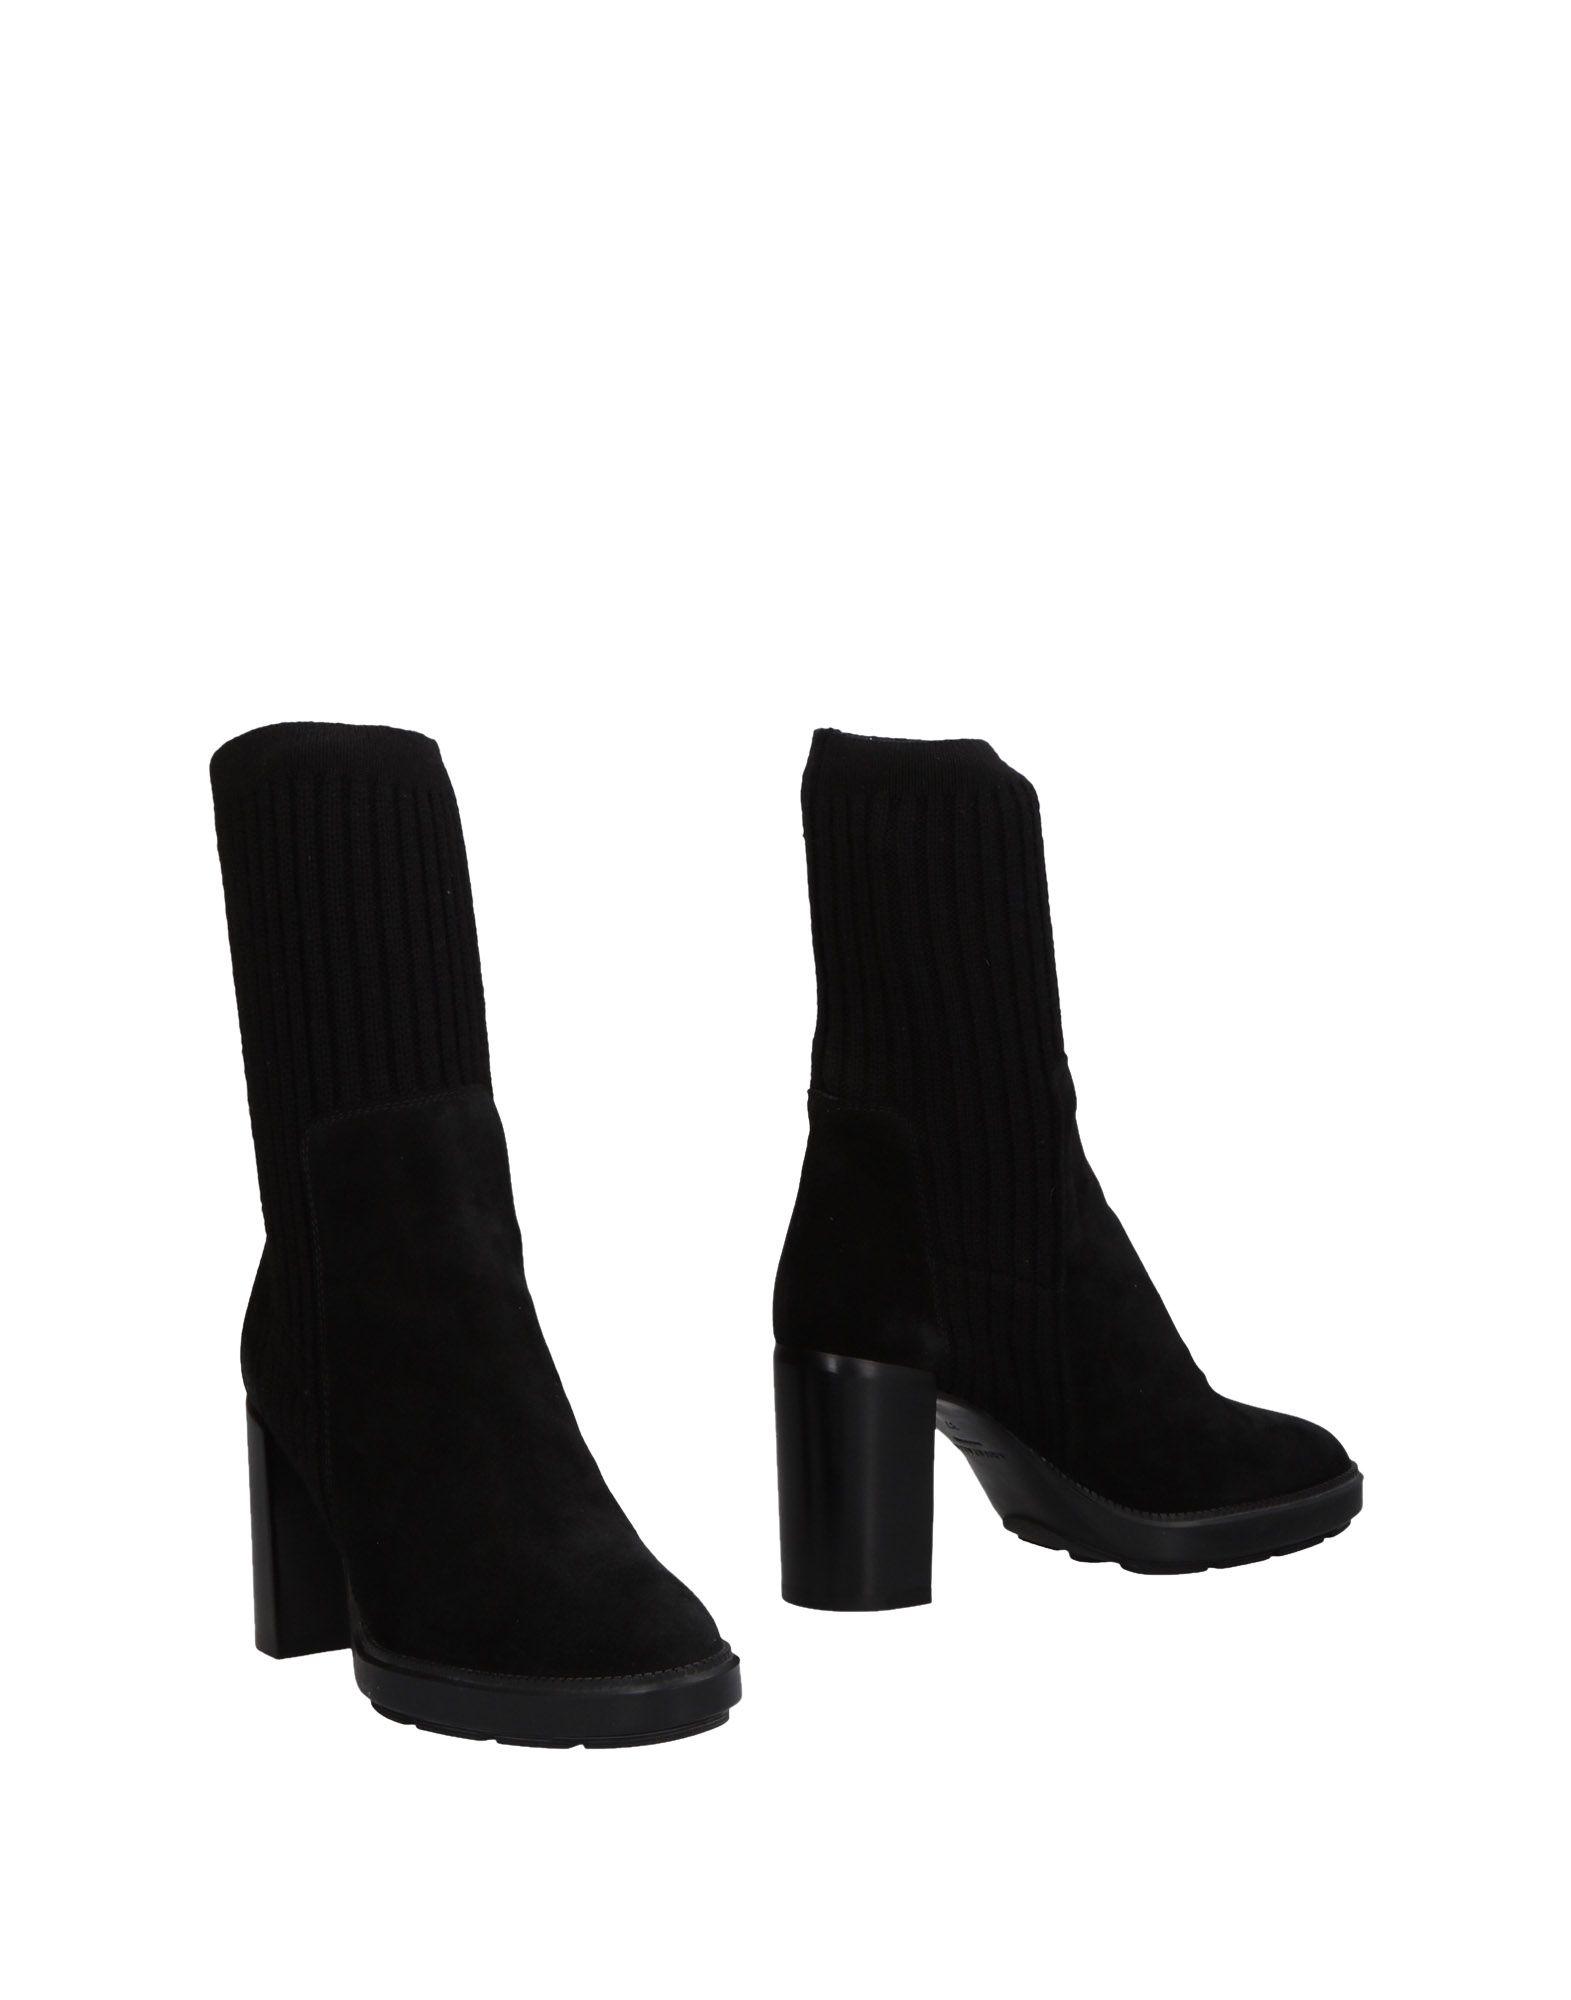 Aquatalia By Marvin K Ankle Boot Footwear Yoox Com